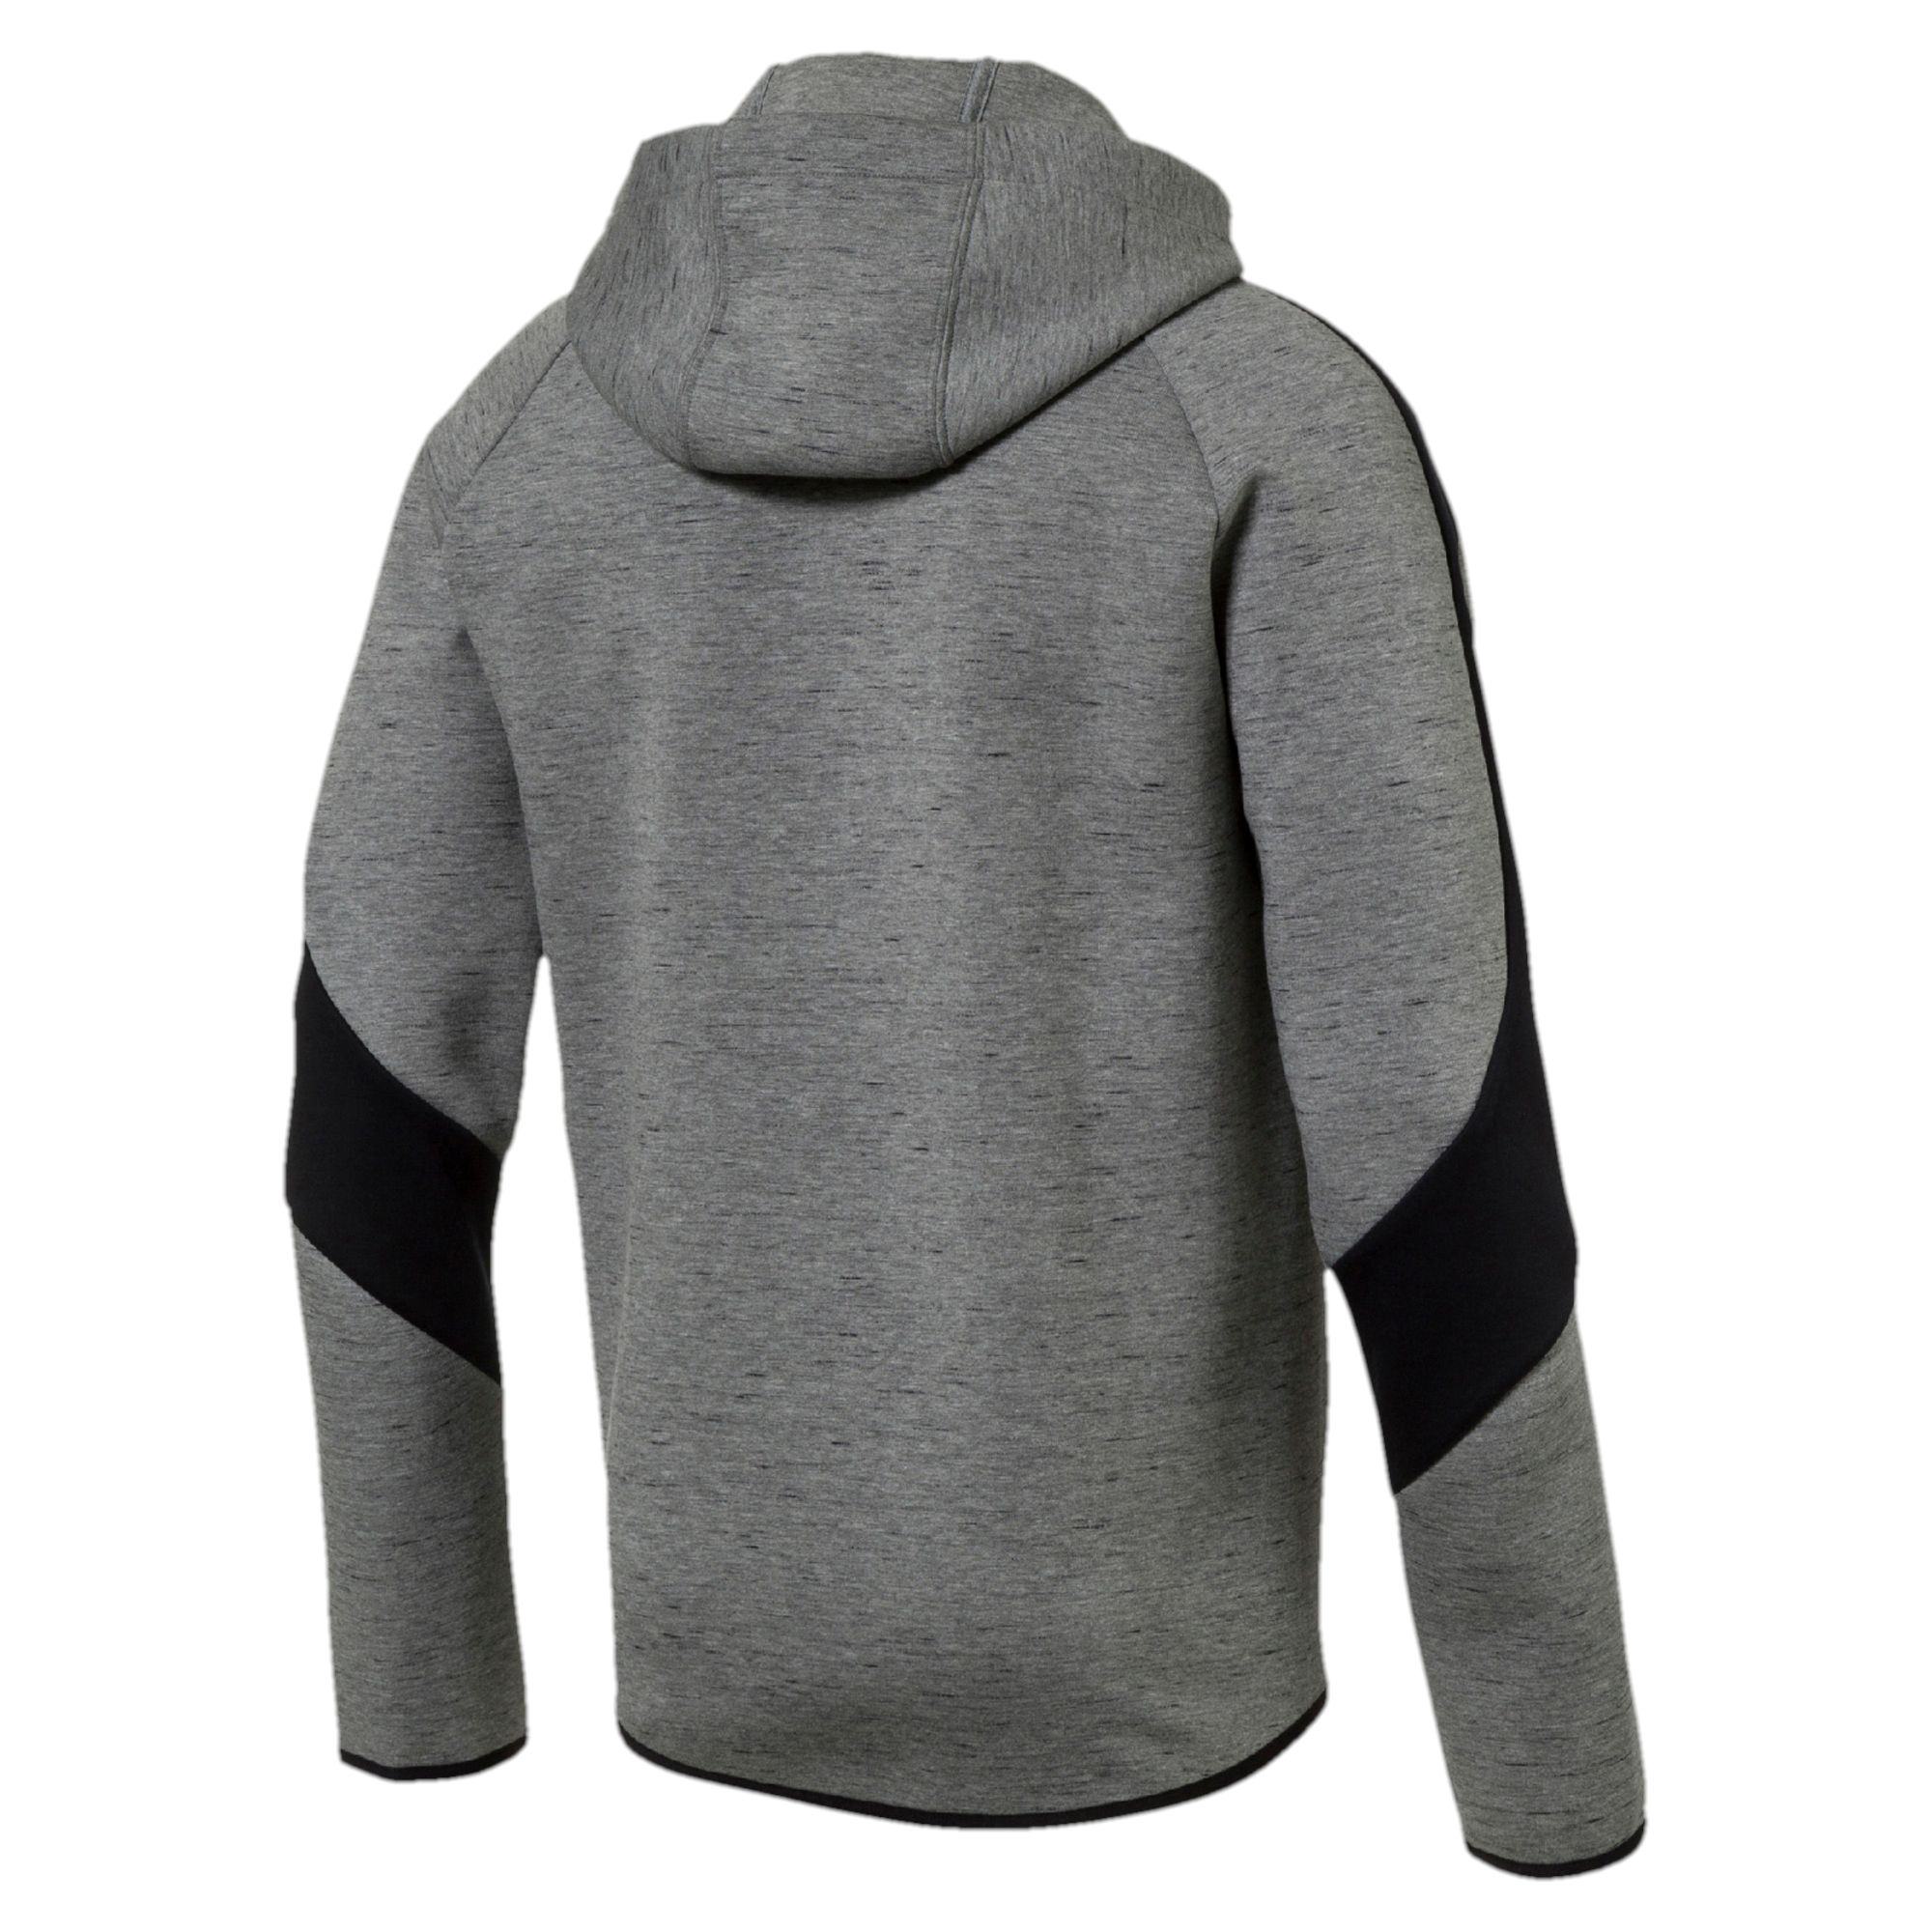 puma euro ferrari kid t sale motorsport sleeve shop clothing kids long shirt s